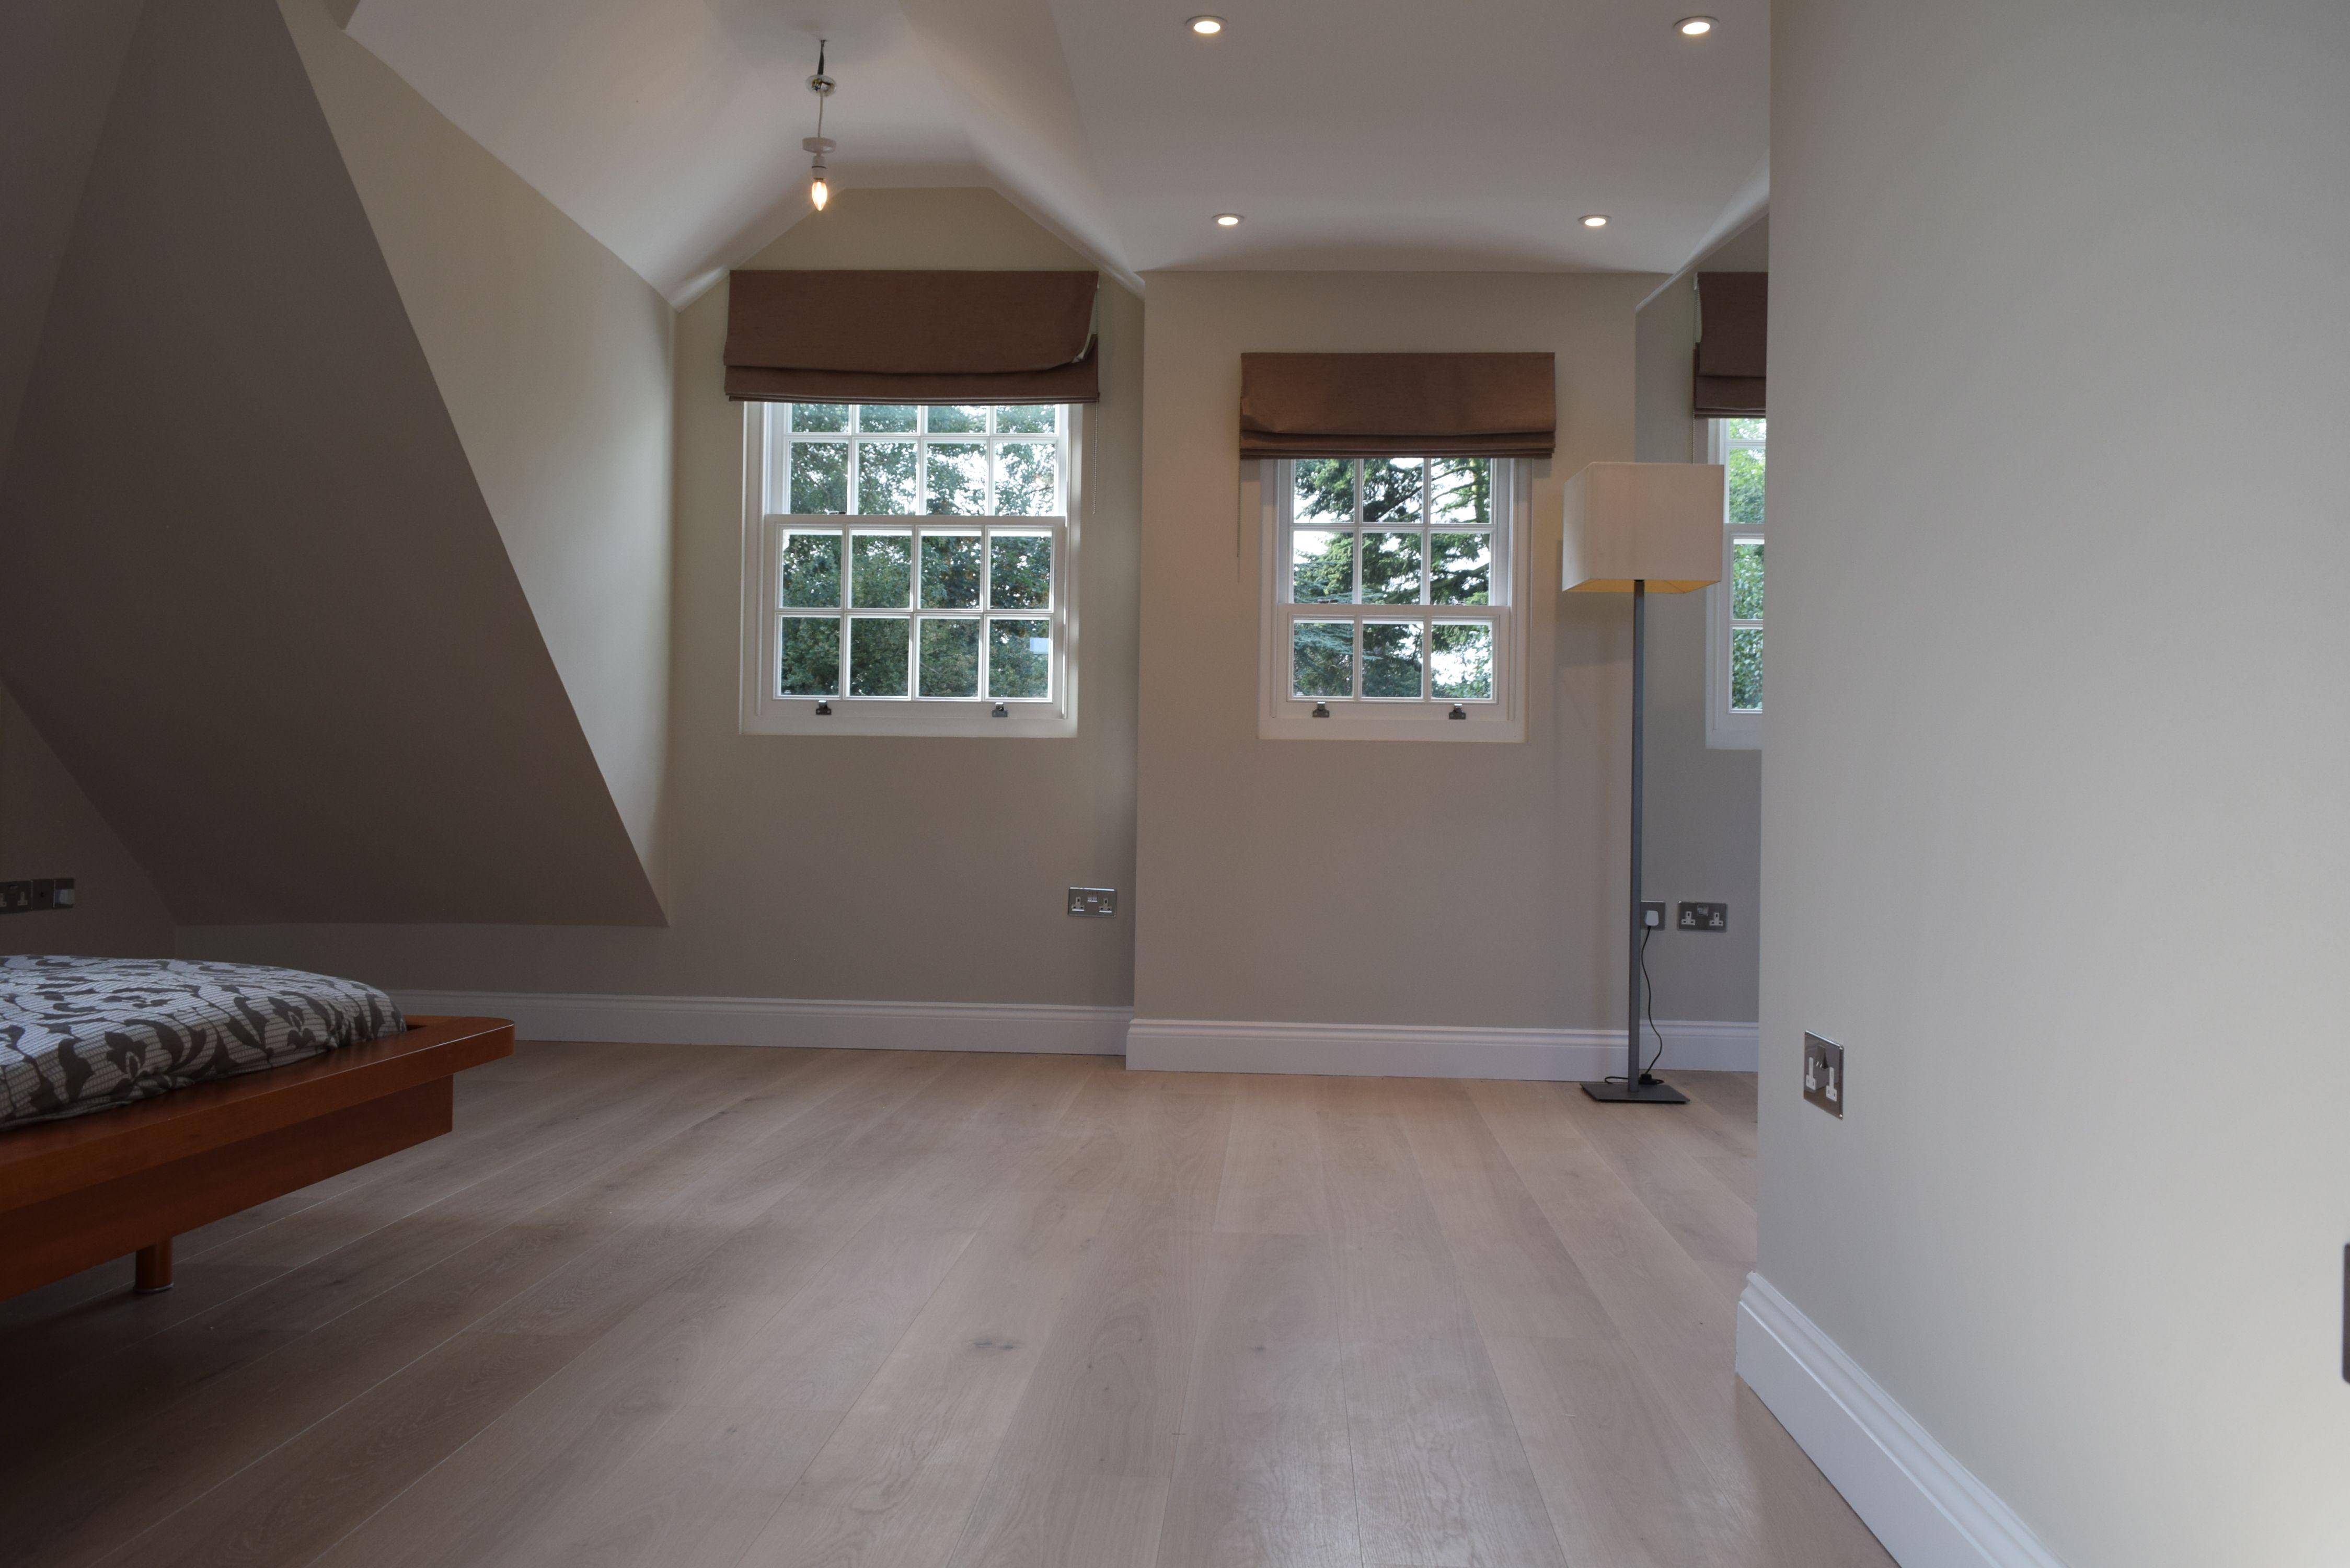 Master Bedroom Ensuite Designs Best Dormer Loft Conversion Into Master Bedroom Suite With Ensuite Review